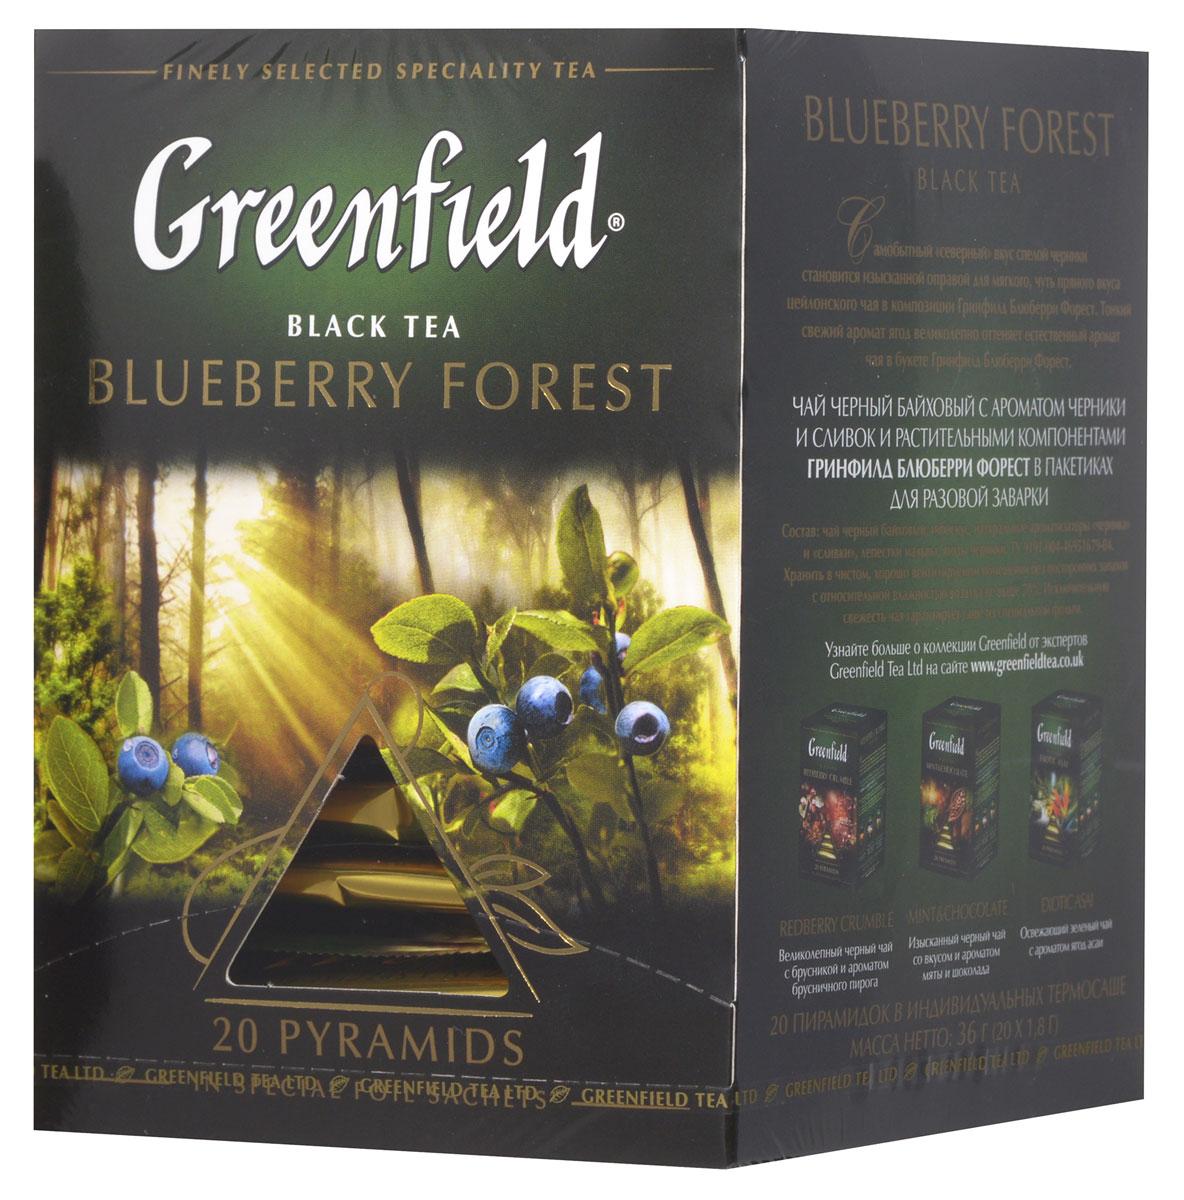 Greenfield Blueberry Forest черный чай в пирамидках, 20 шт greenfield milky oolong чай улун в пирамидках 20 шт